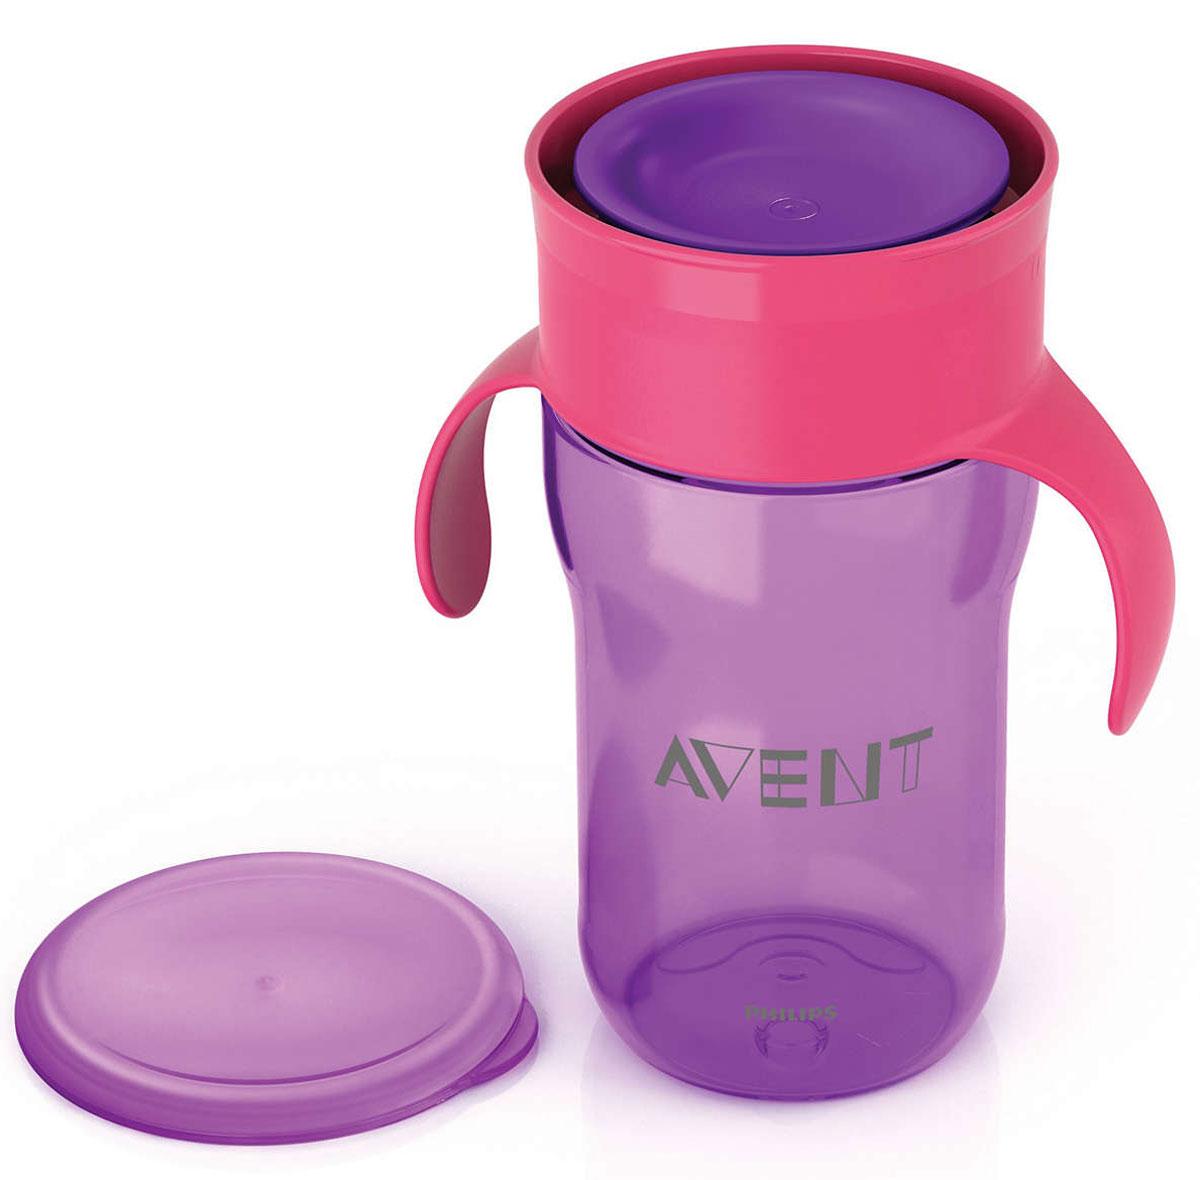 Philips Avent Взрослая чашка, 340 мл, 18м+, 1 шт фиолетовый SCF784/00 авент кружка поильник взрослая чашка разноцветная 340мл арт 83480 scf784 00